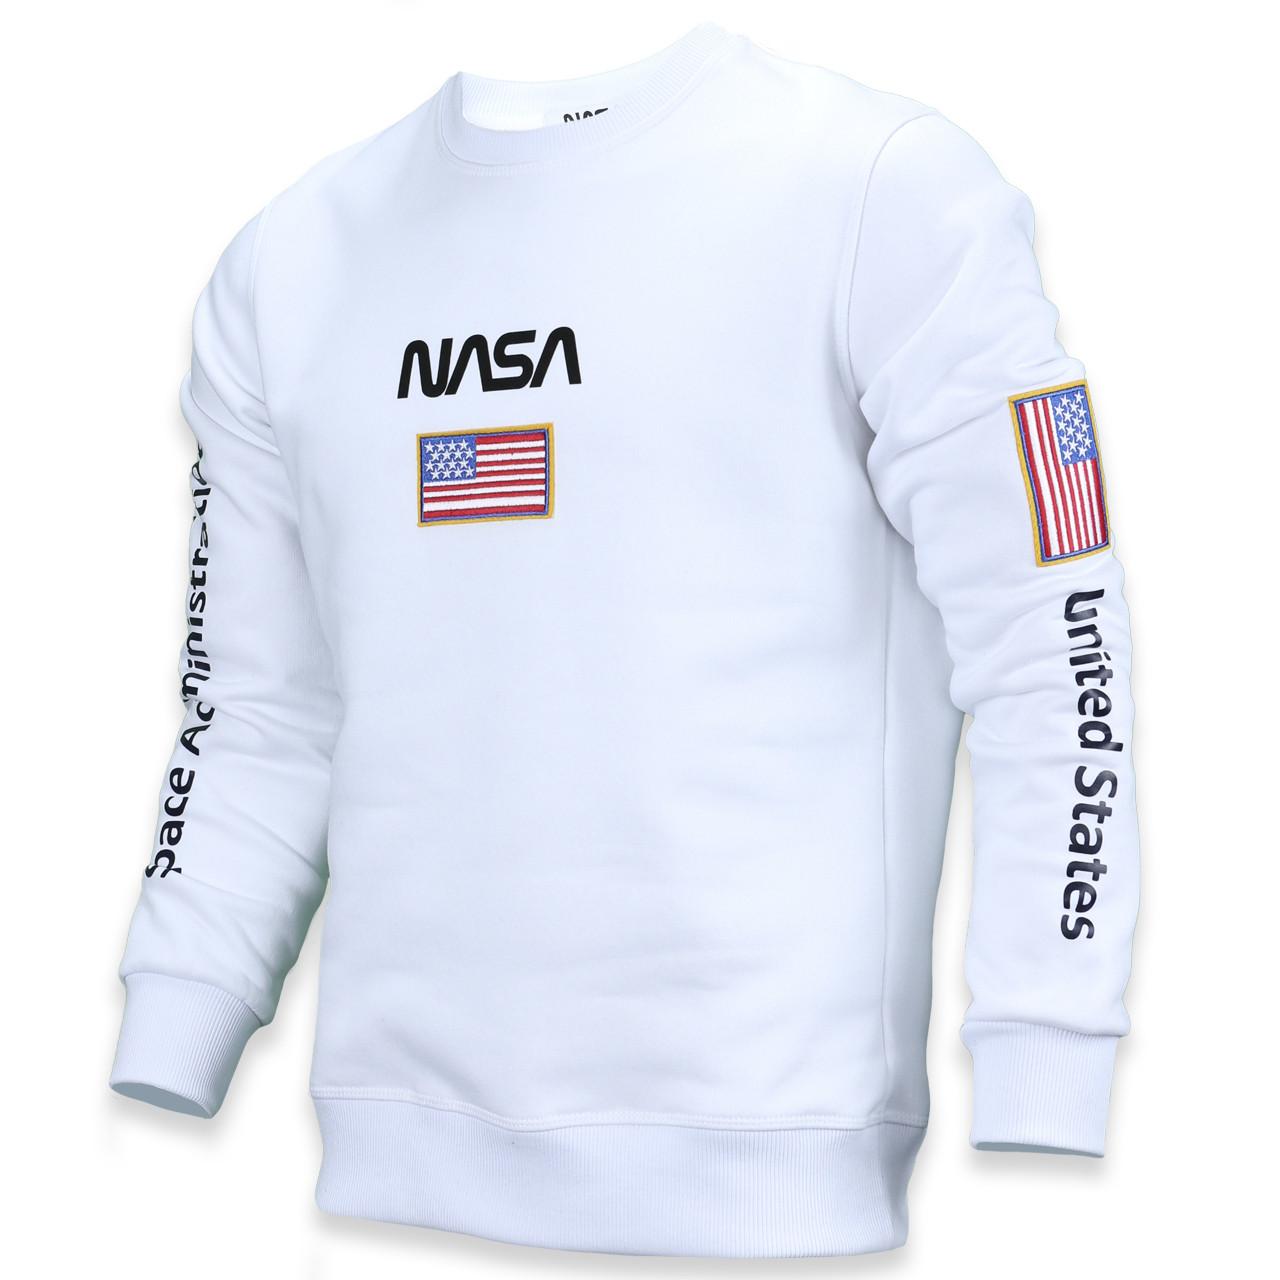 Свитшот осень-зима мужской белый NASA №5 патч, рис на рукавах WHT M(Р) 20-522-003-003